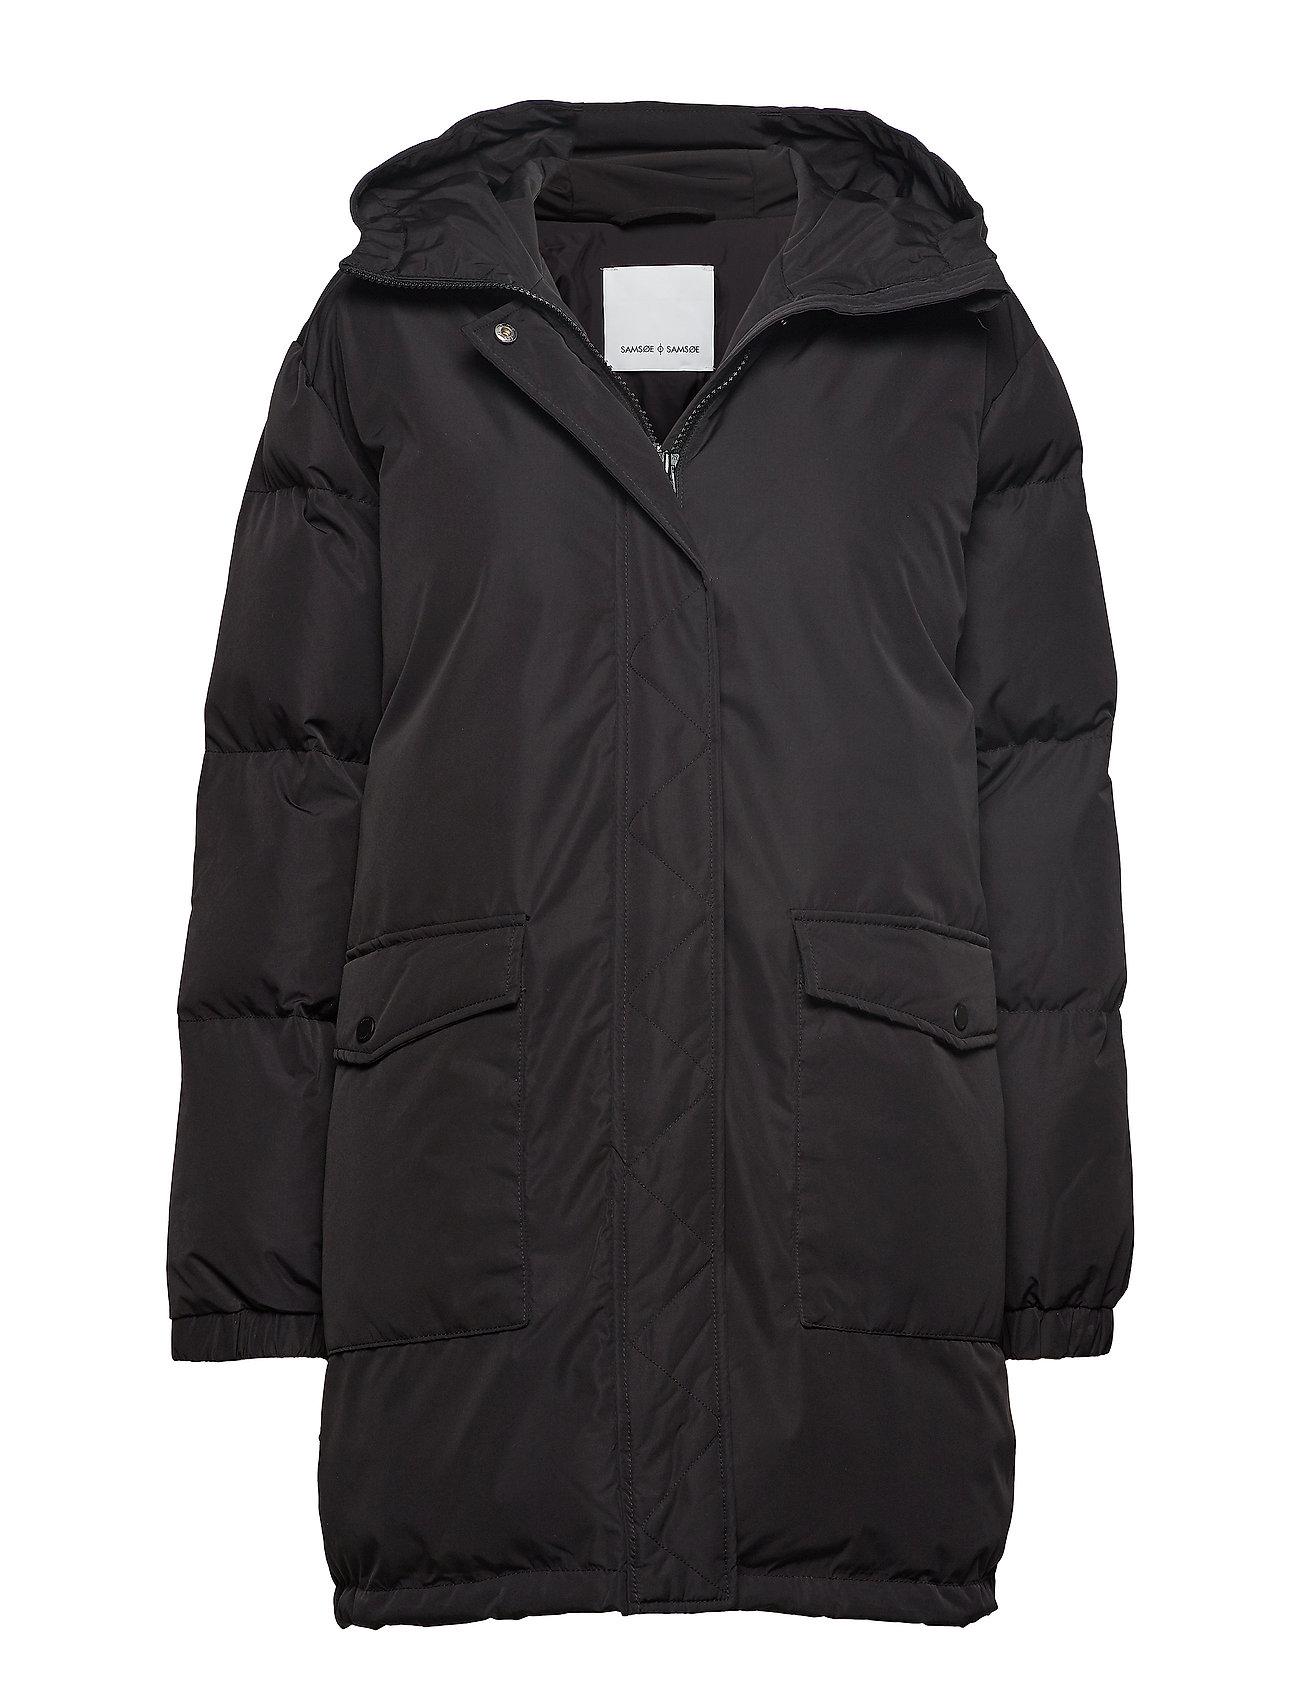 Samsøe & Samsøe Okina jacket 10179 - BLACK